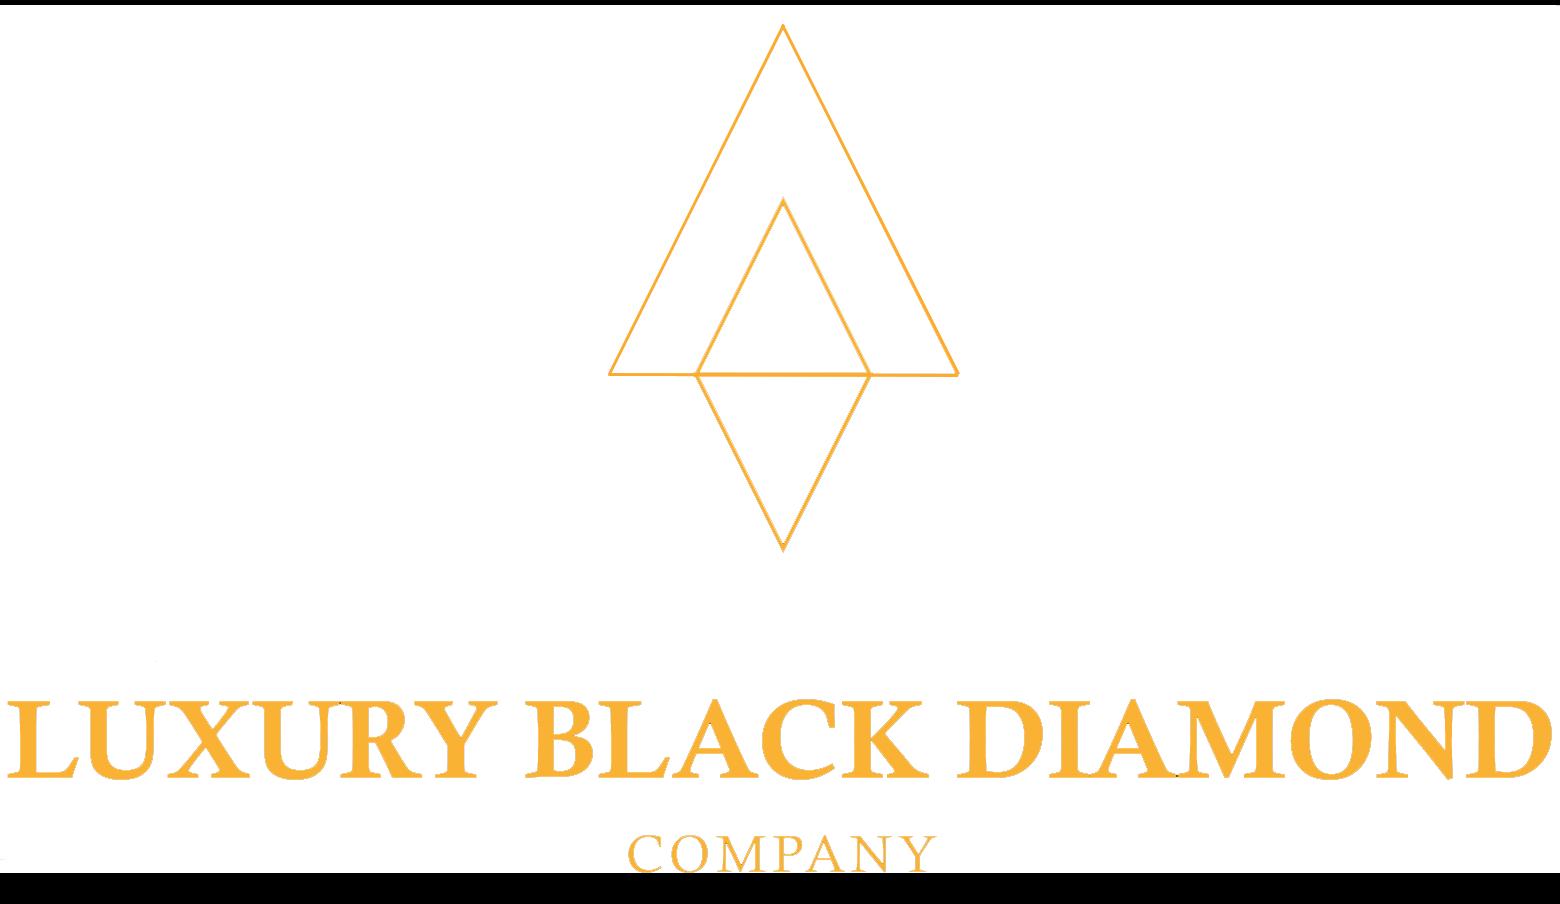 Luxury Black Diamond Company